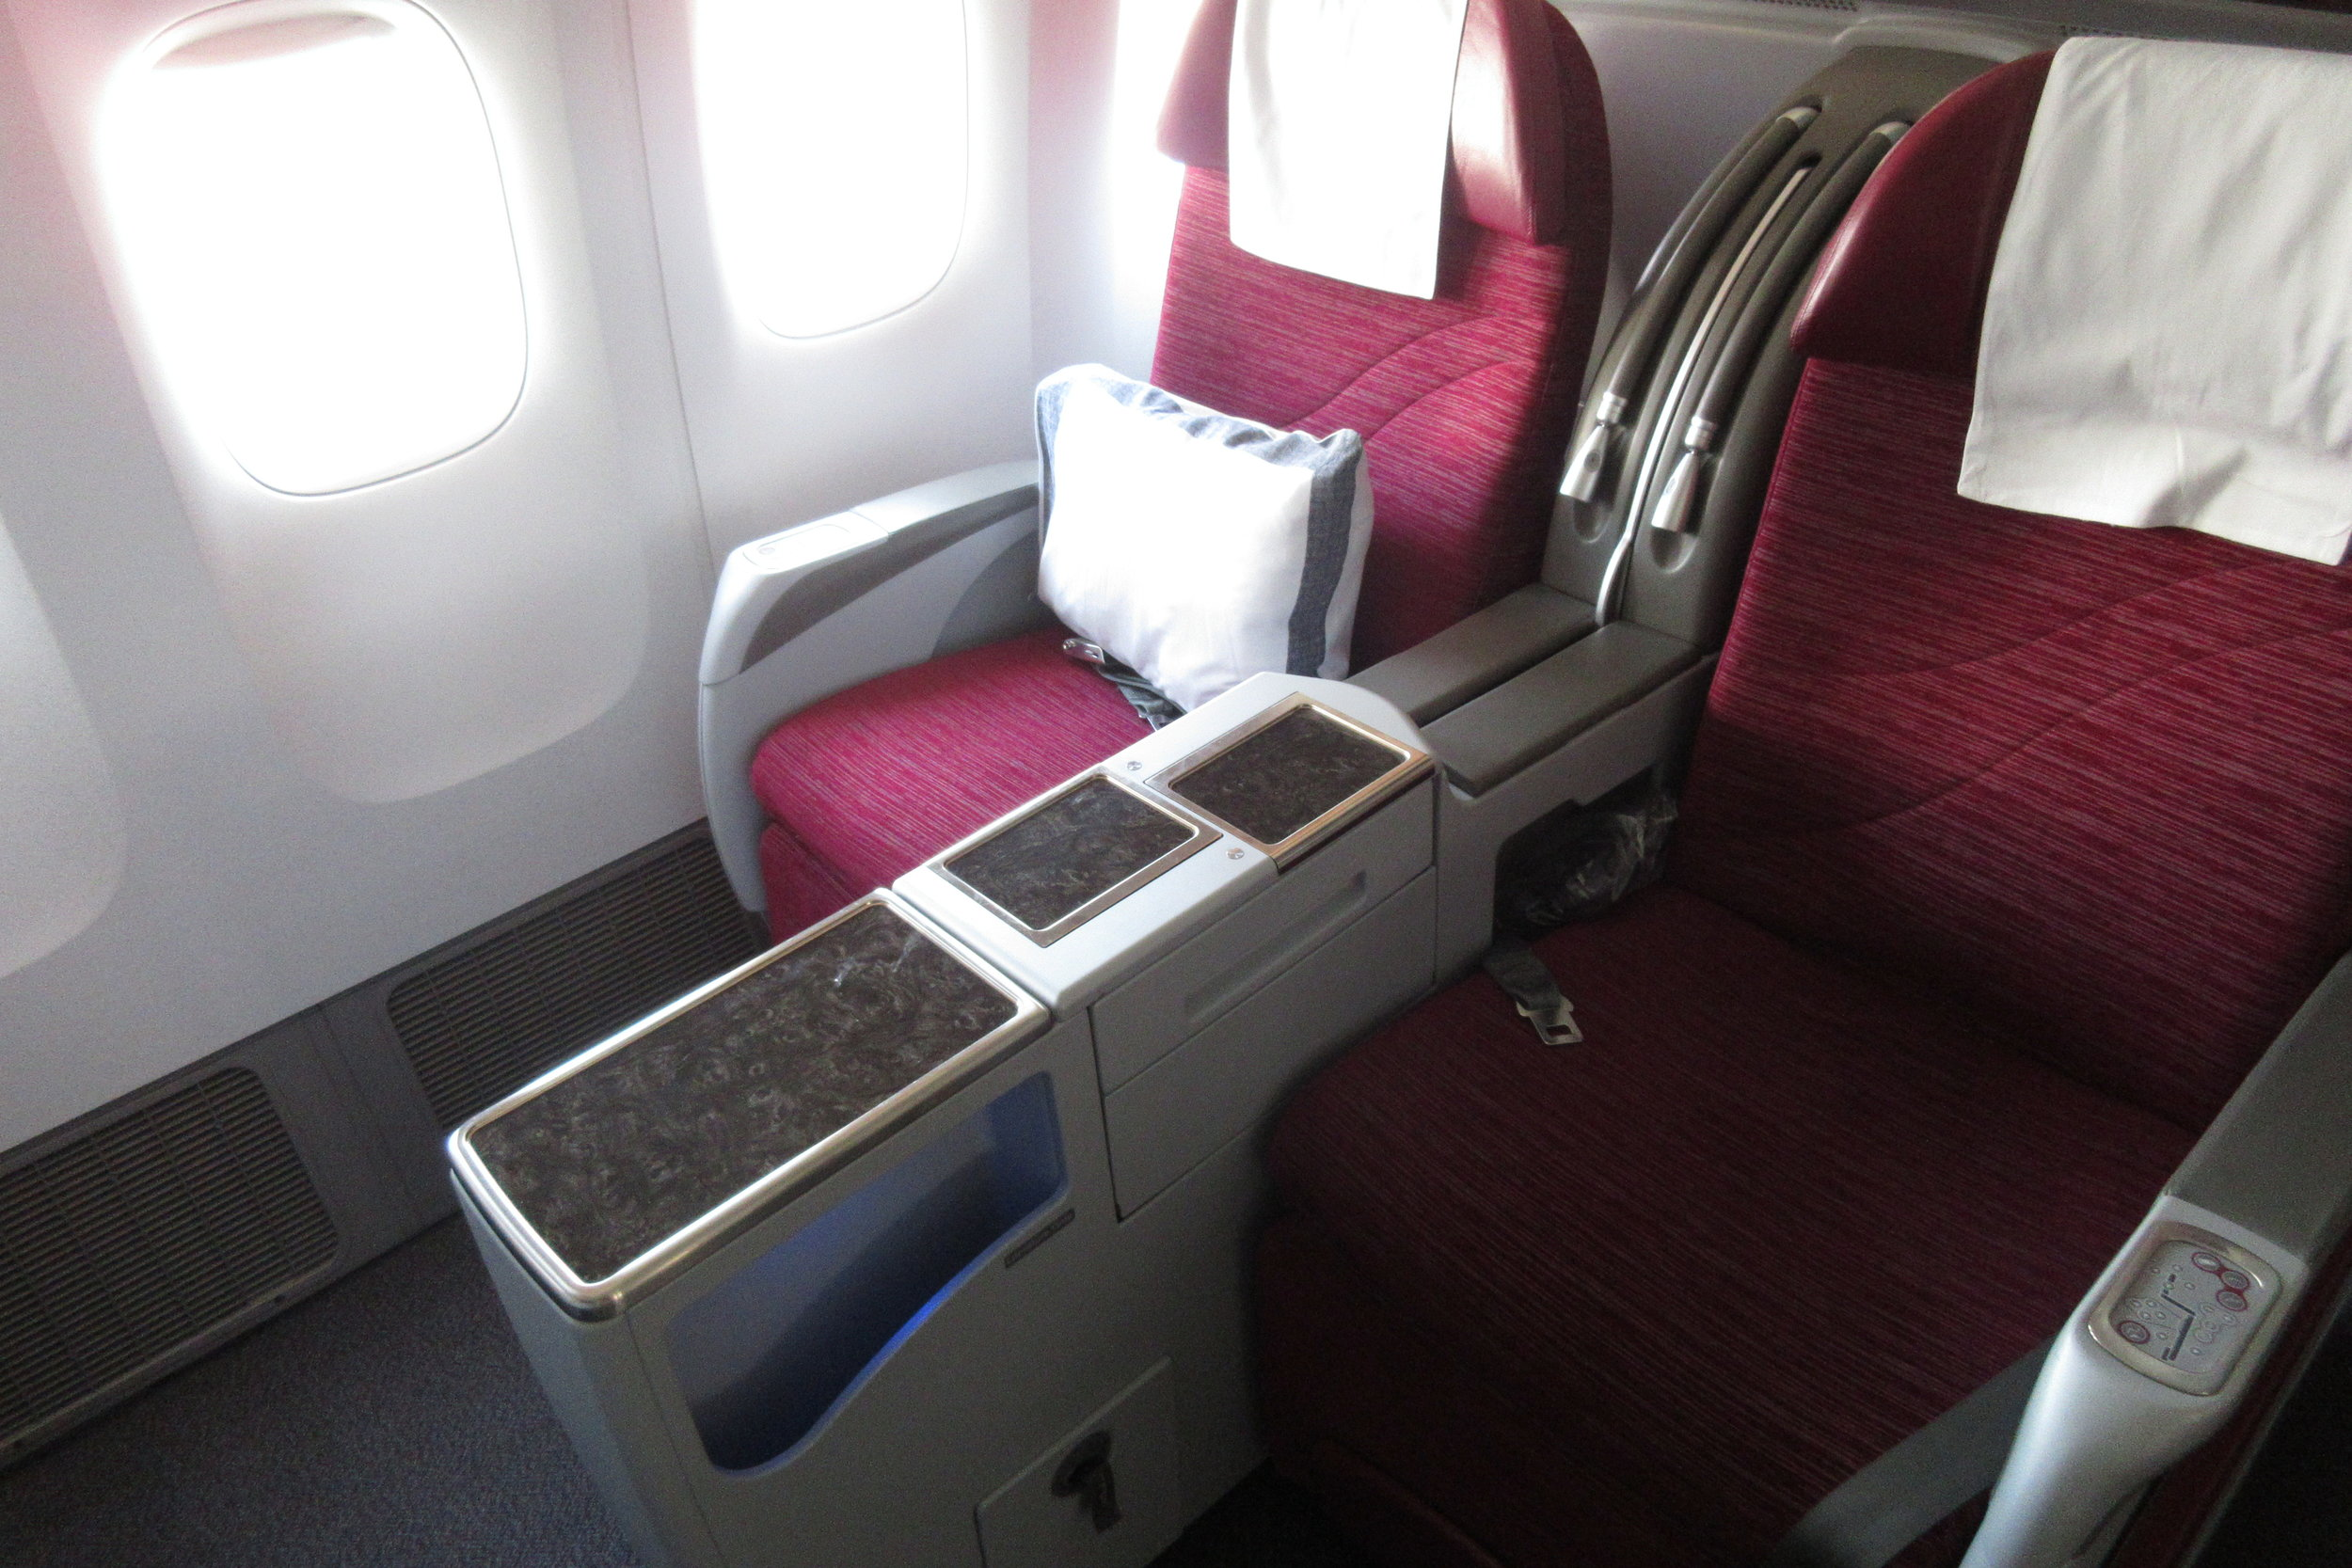 Qatar Airways 777 business class seats